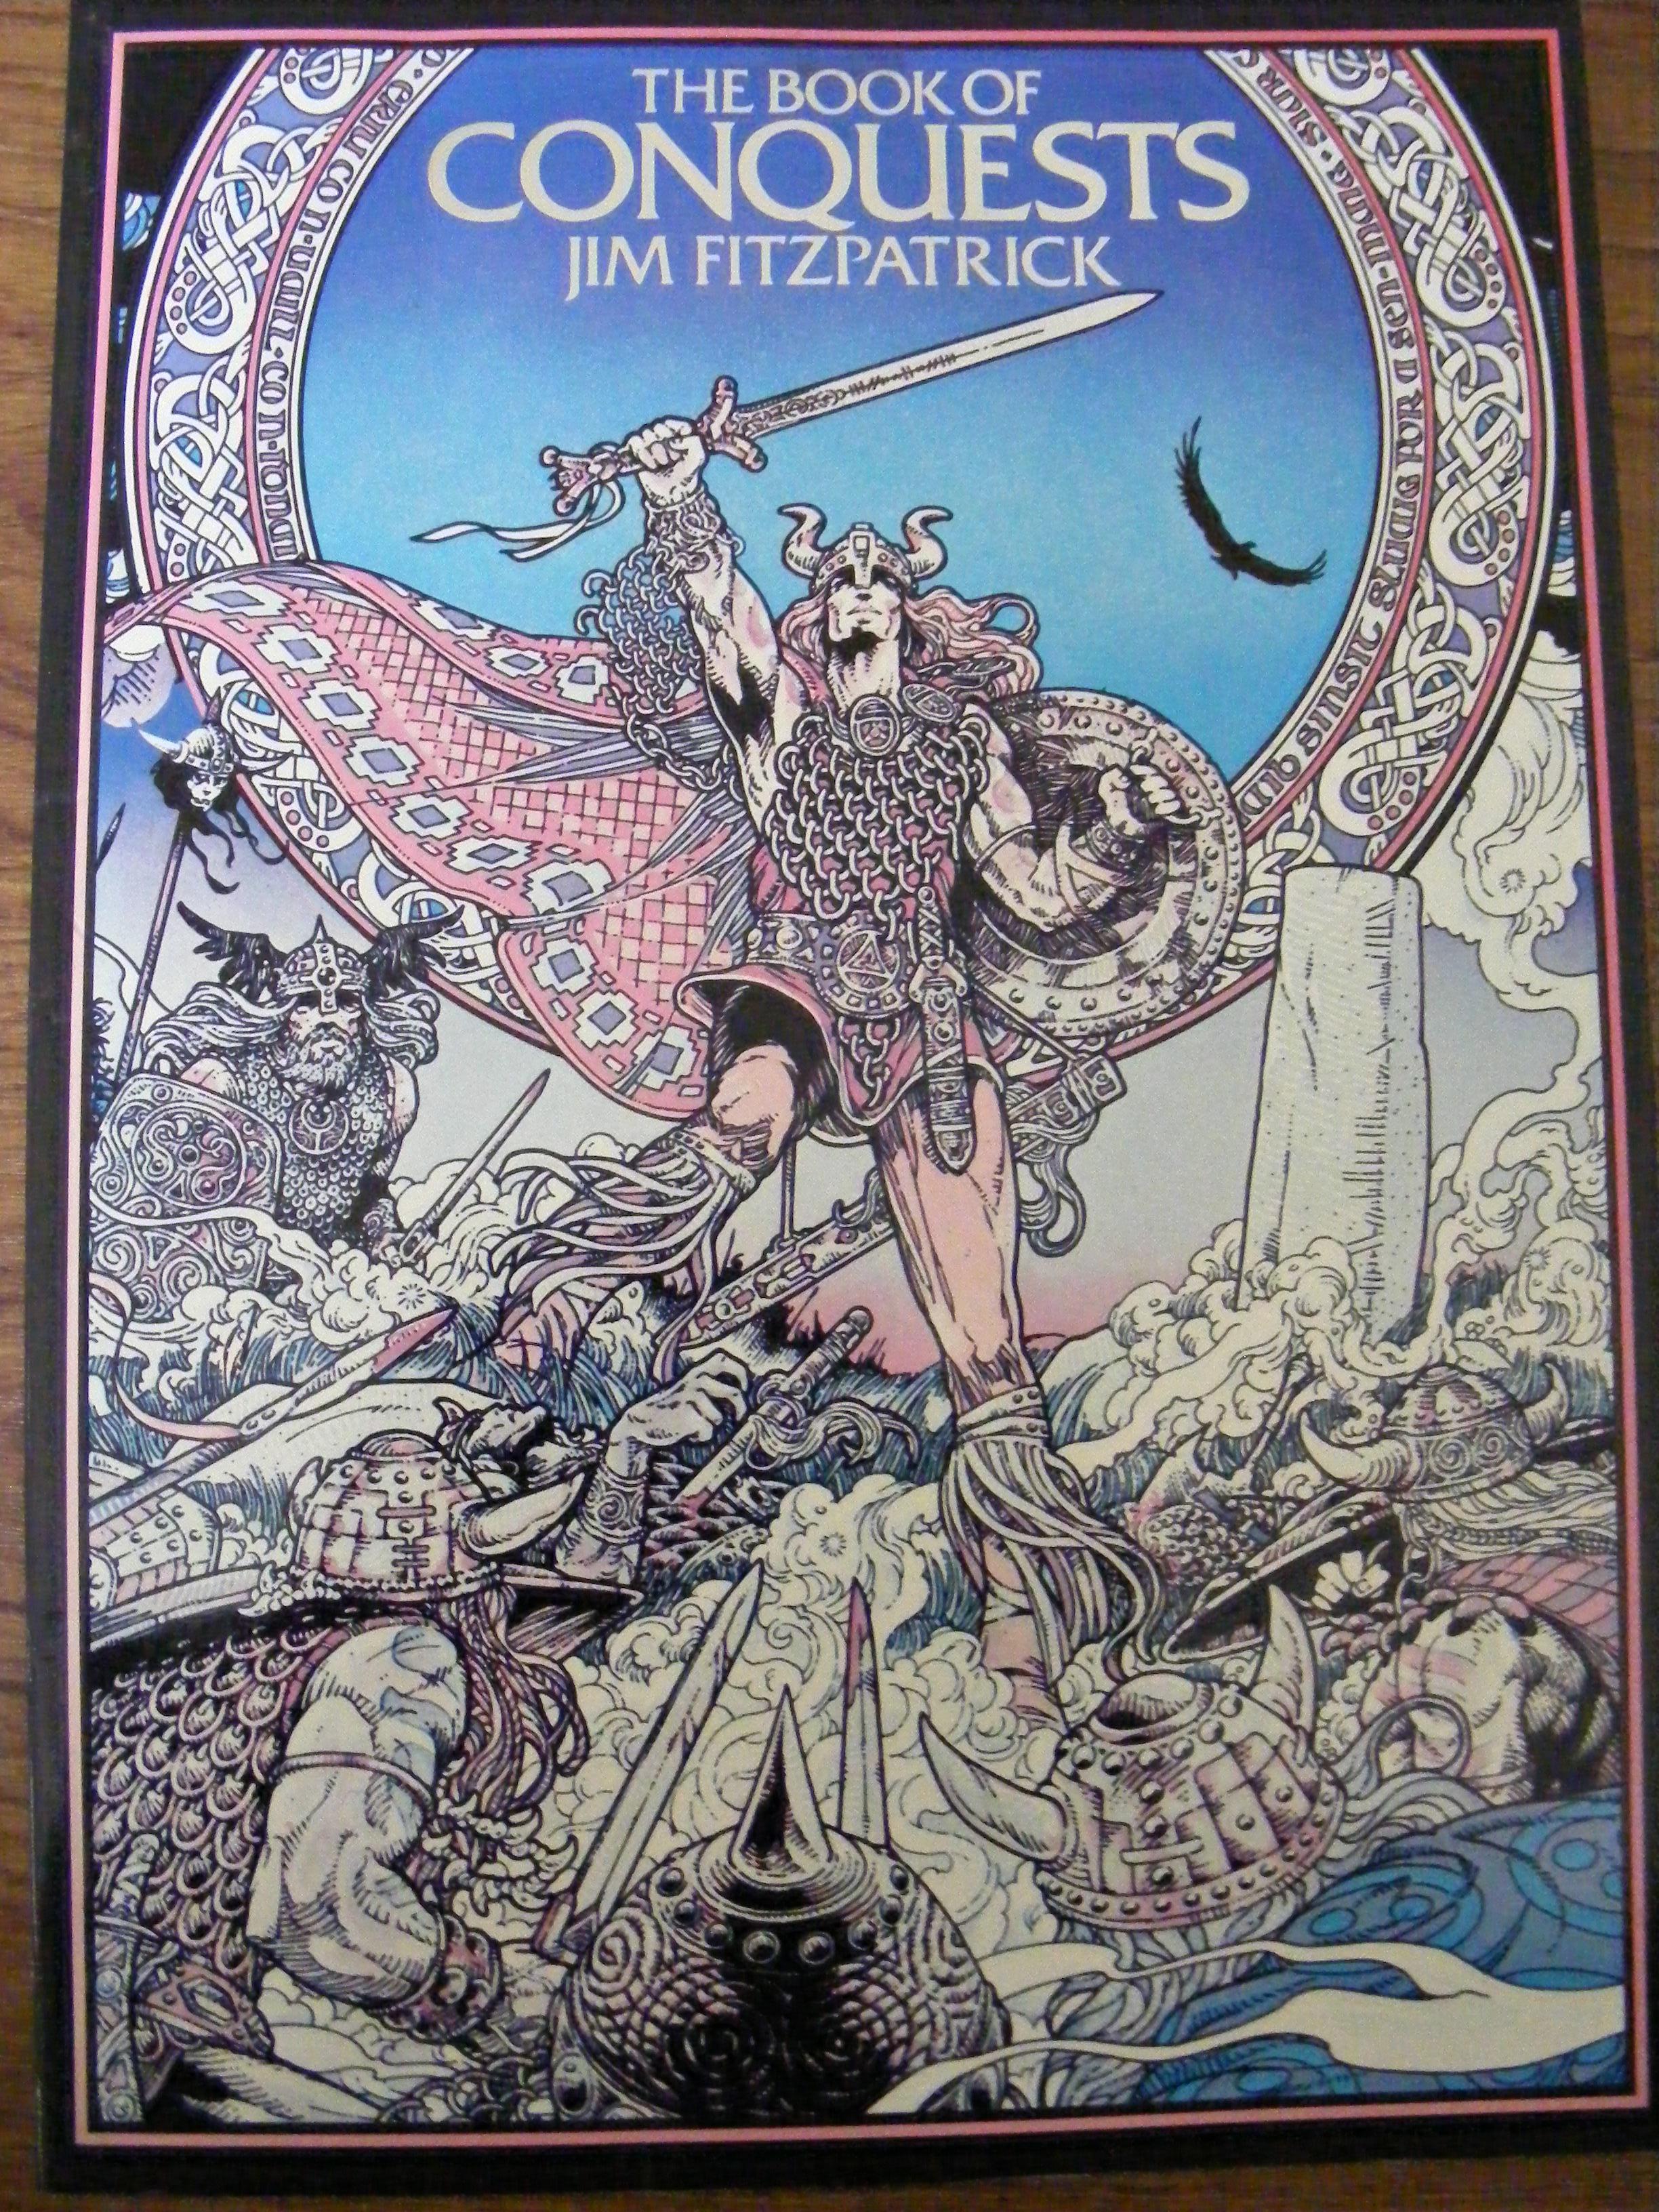 Jim F - Book of Conquests.JPG